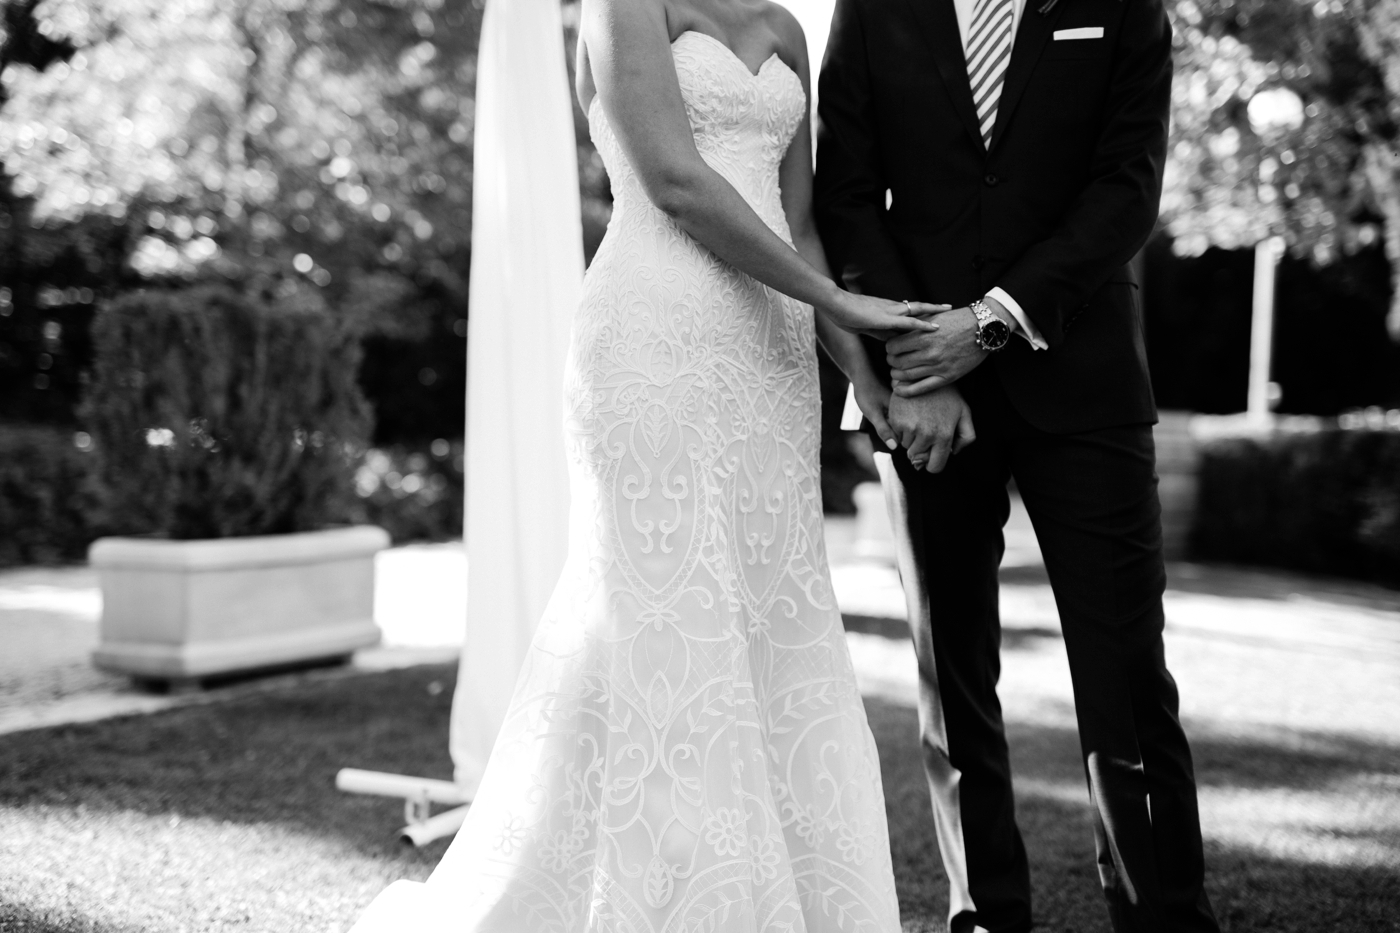 Lauren & Max - Marybank Estate Wedding - Natural wedding photographer in Adelaide - www.katherineschultzphotography.com 62